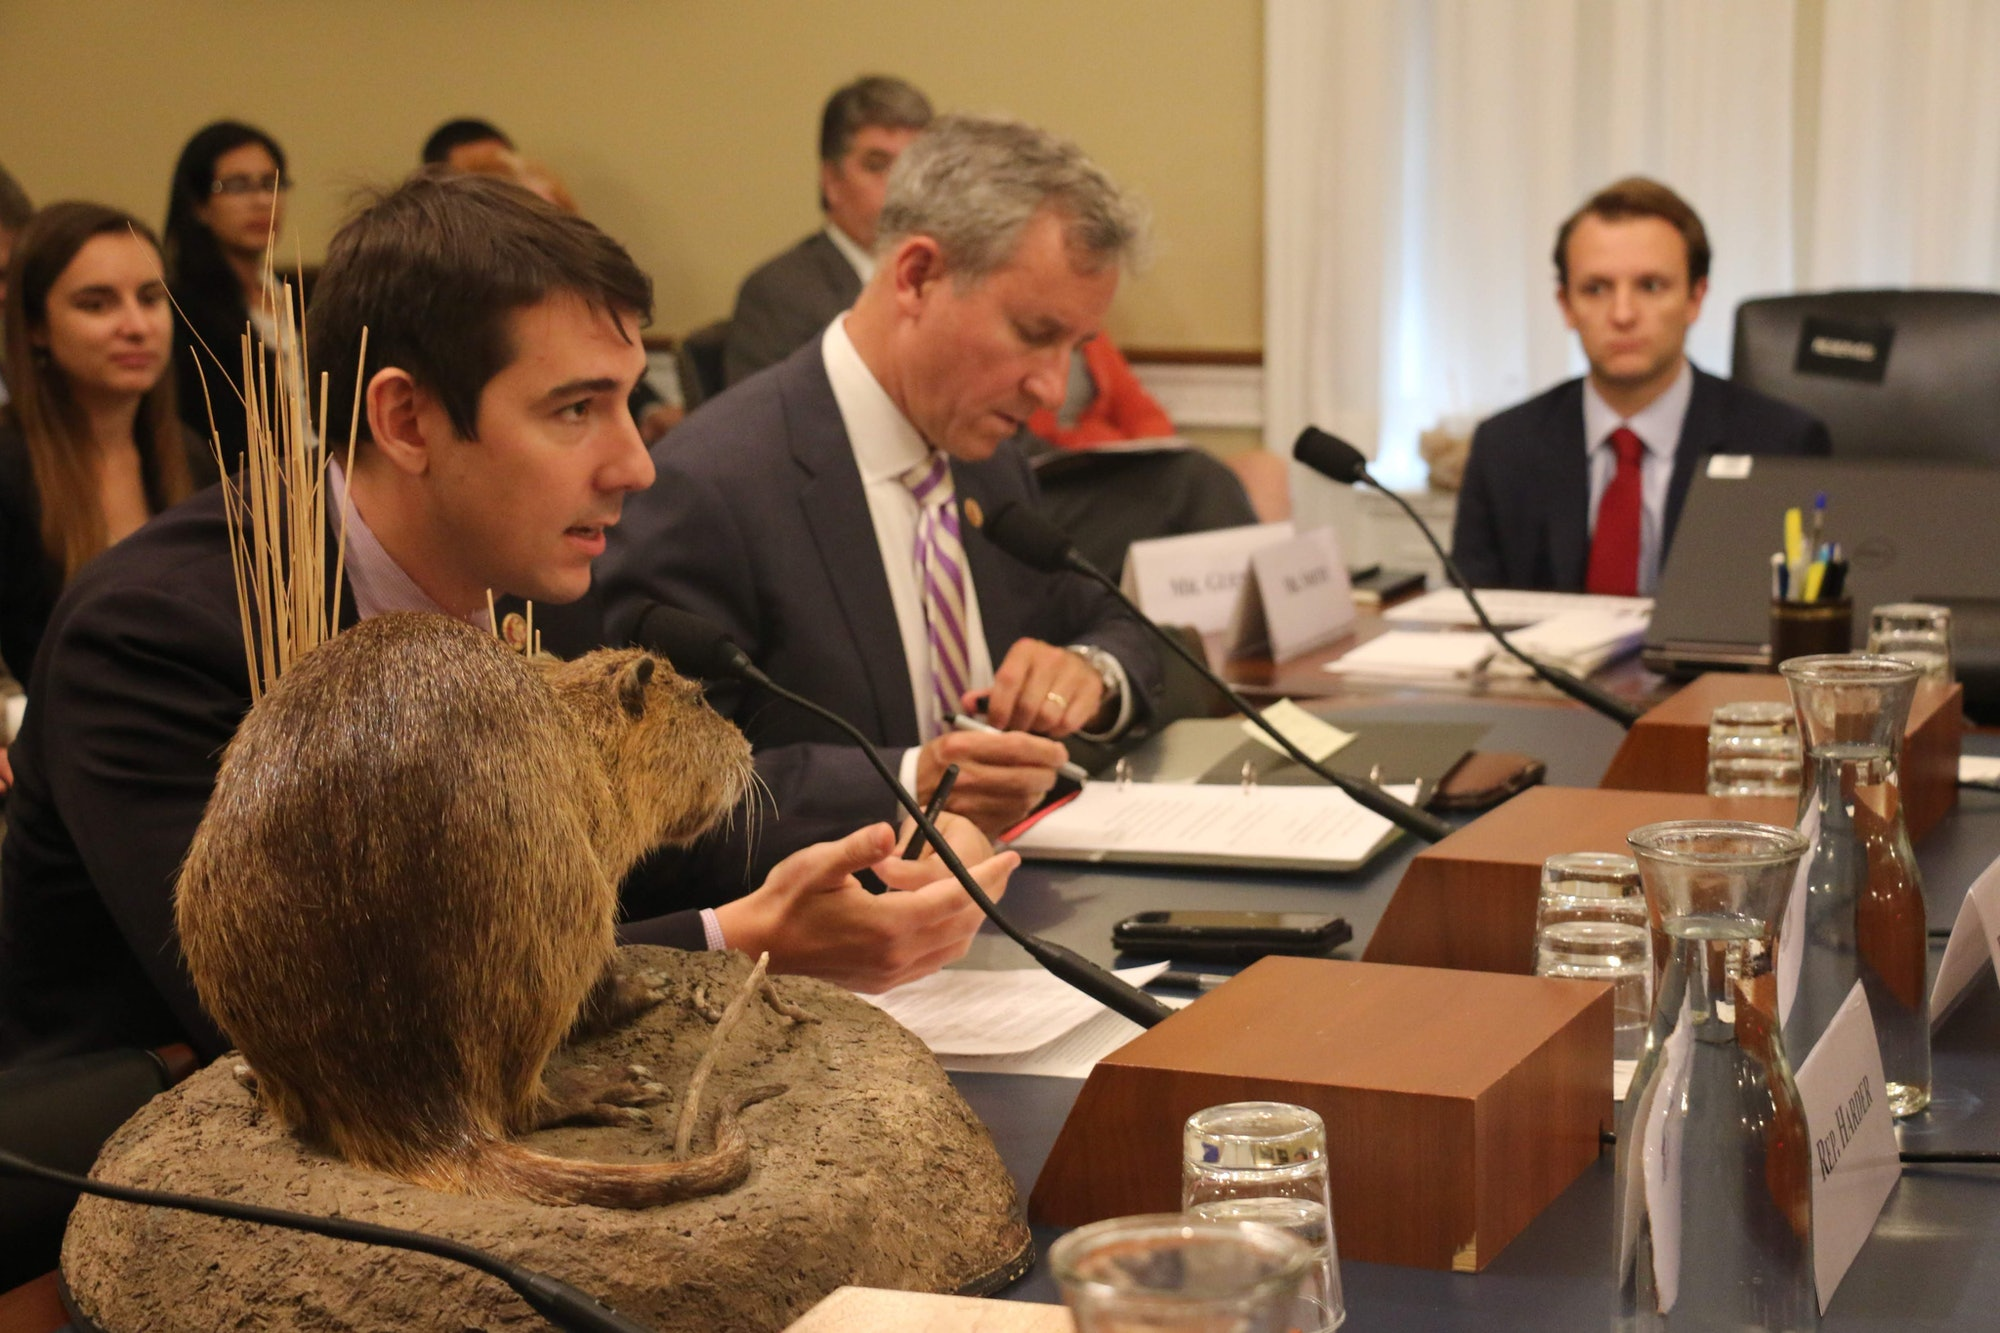 nutria on desk while man talks to Congress